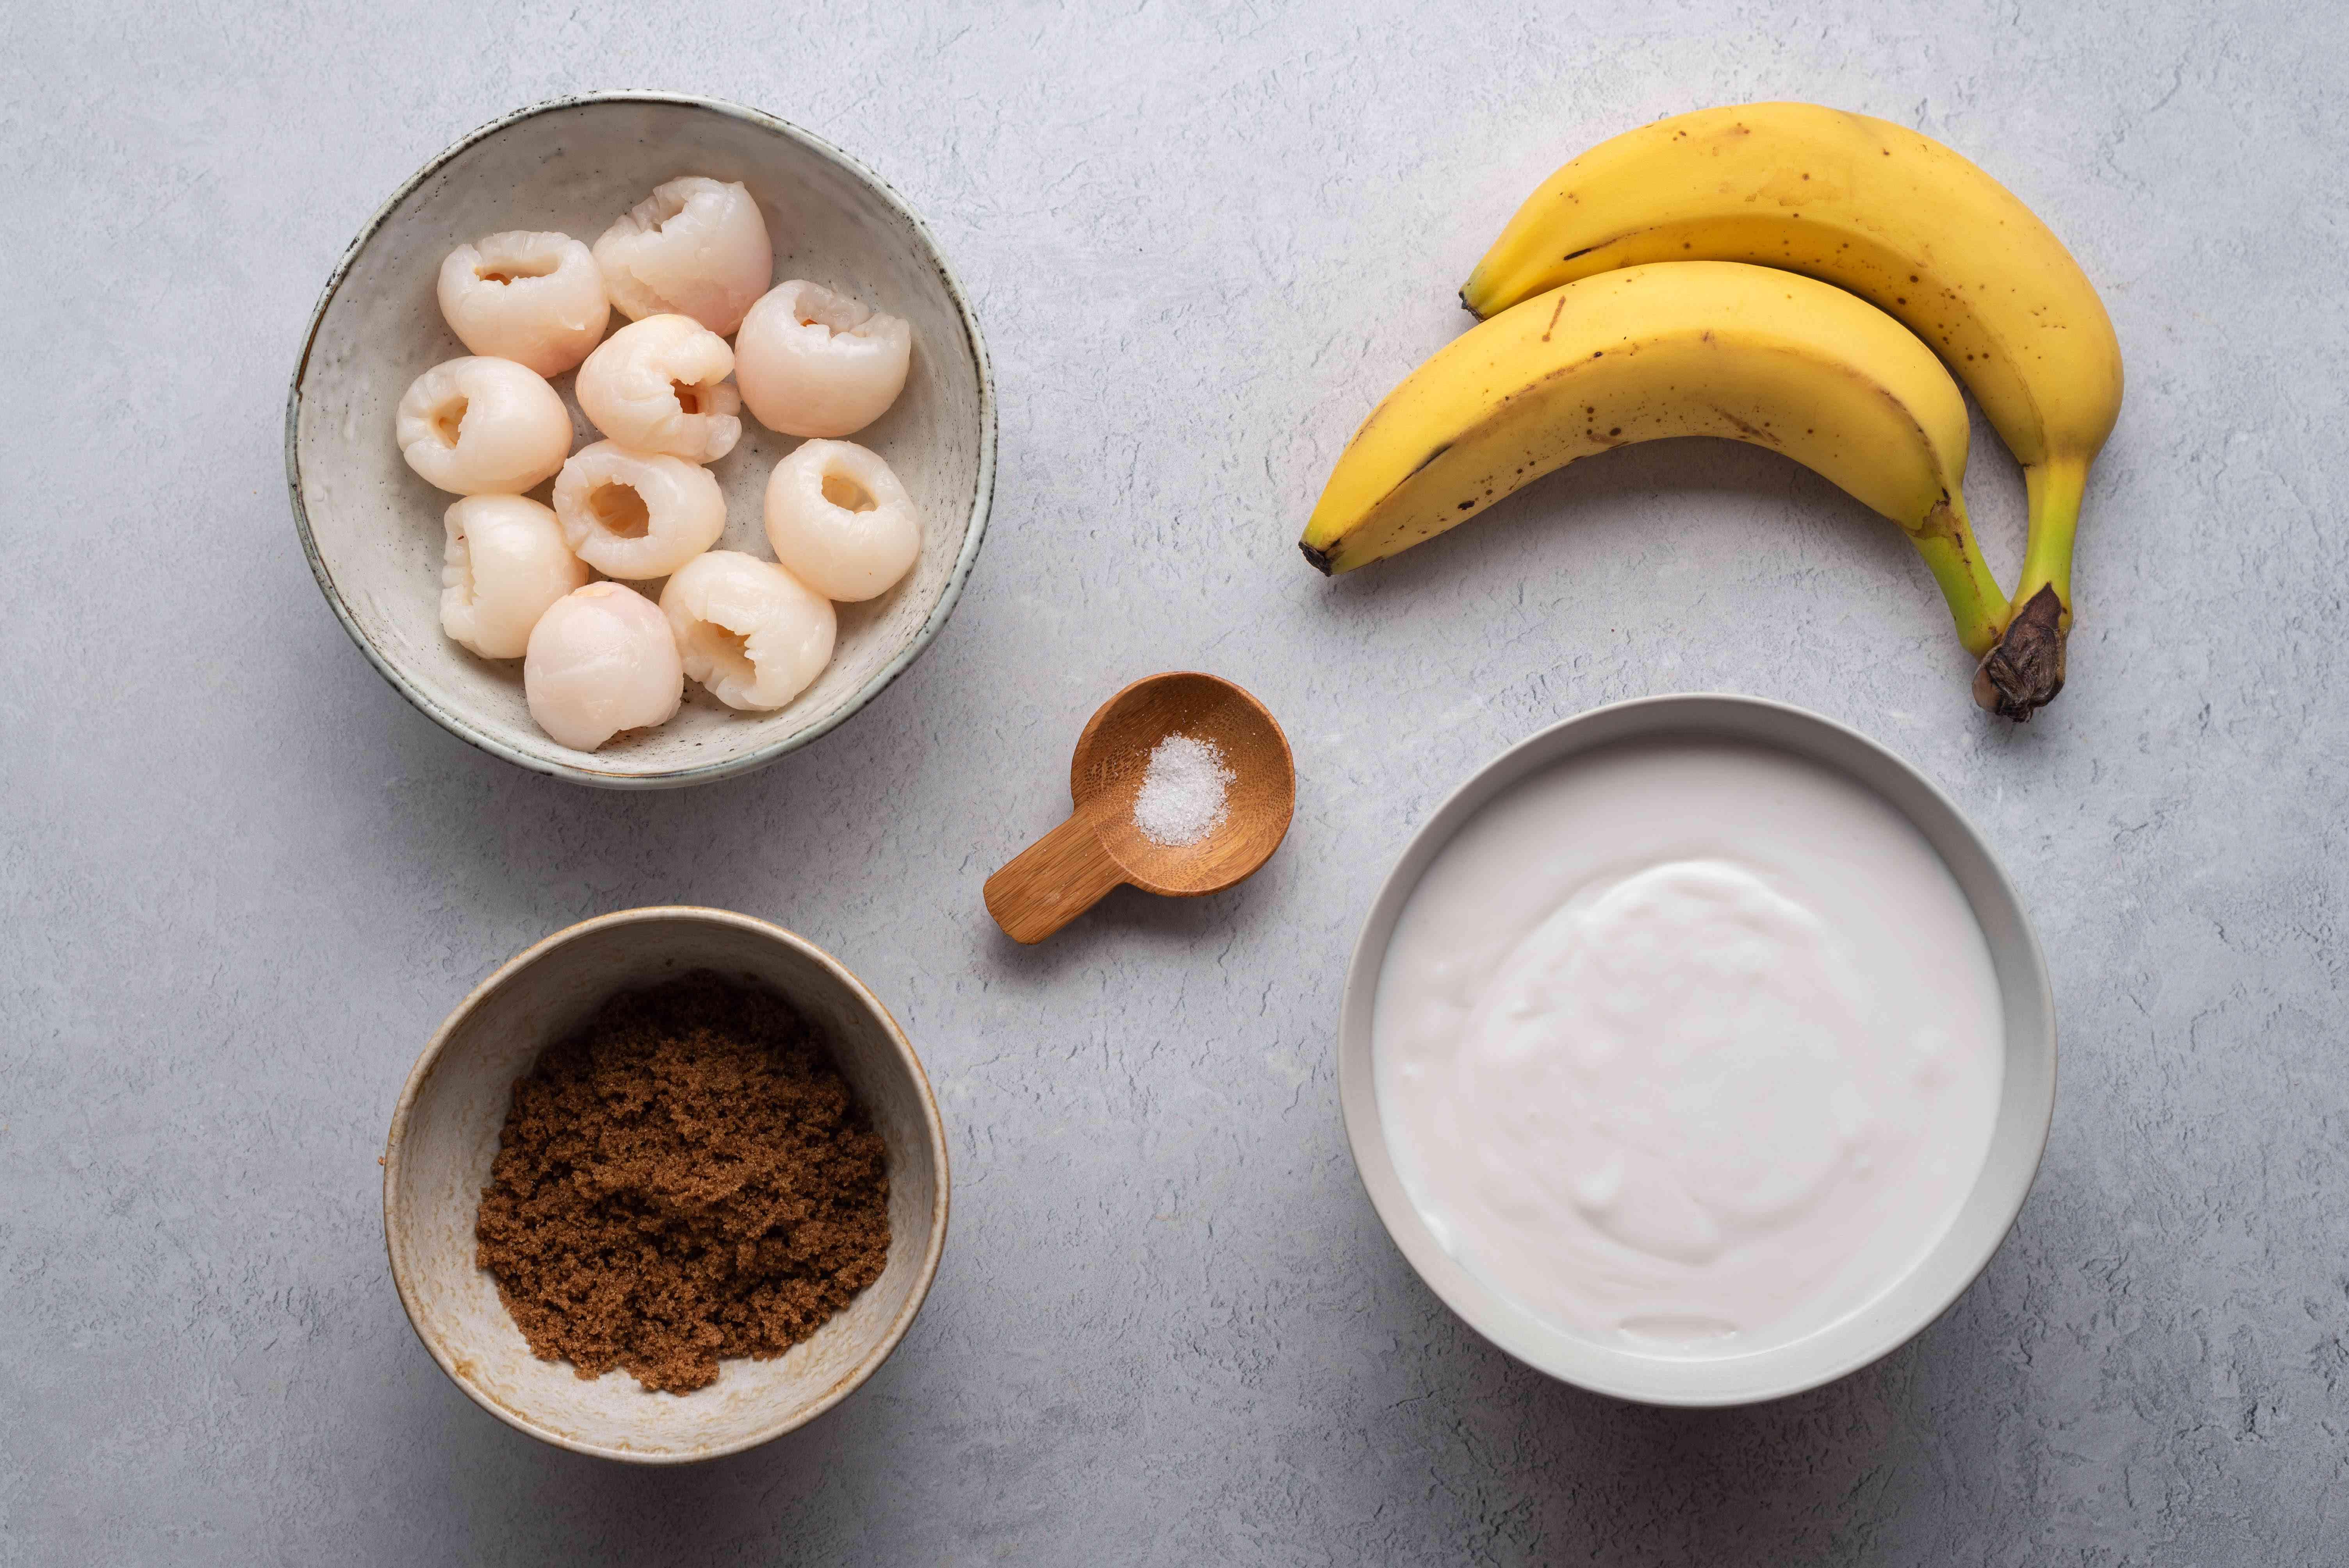 Thai Banana-Lychee Dessert in Coconut Milk ingredients